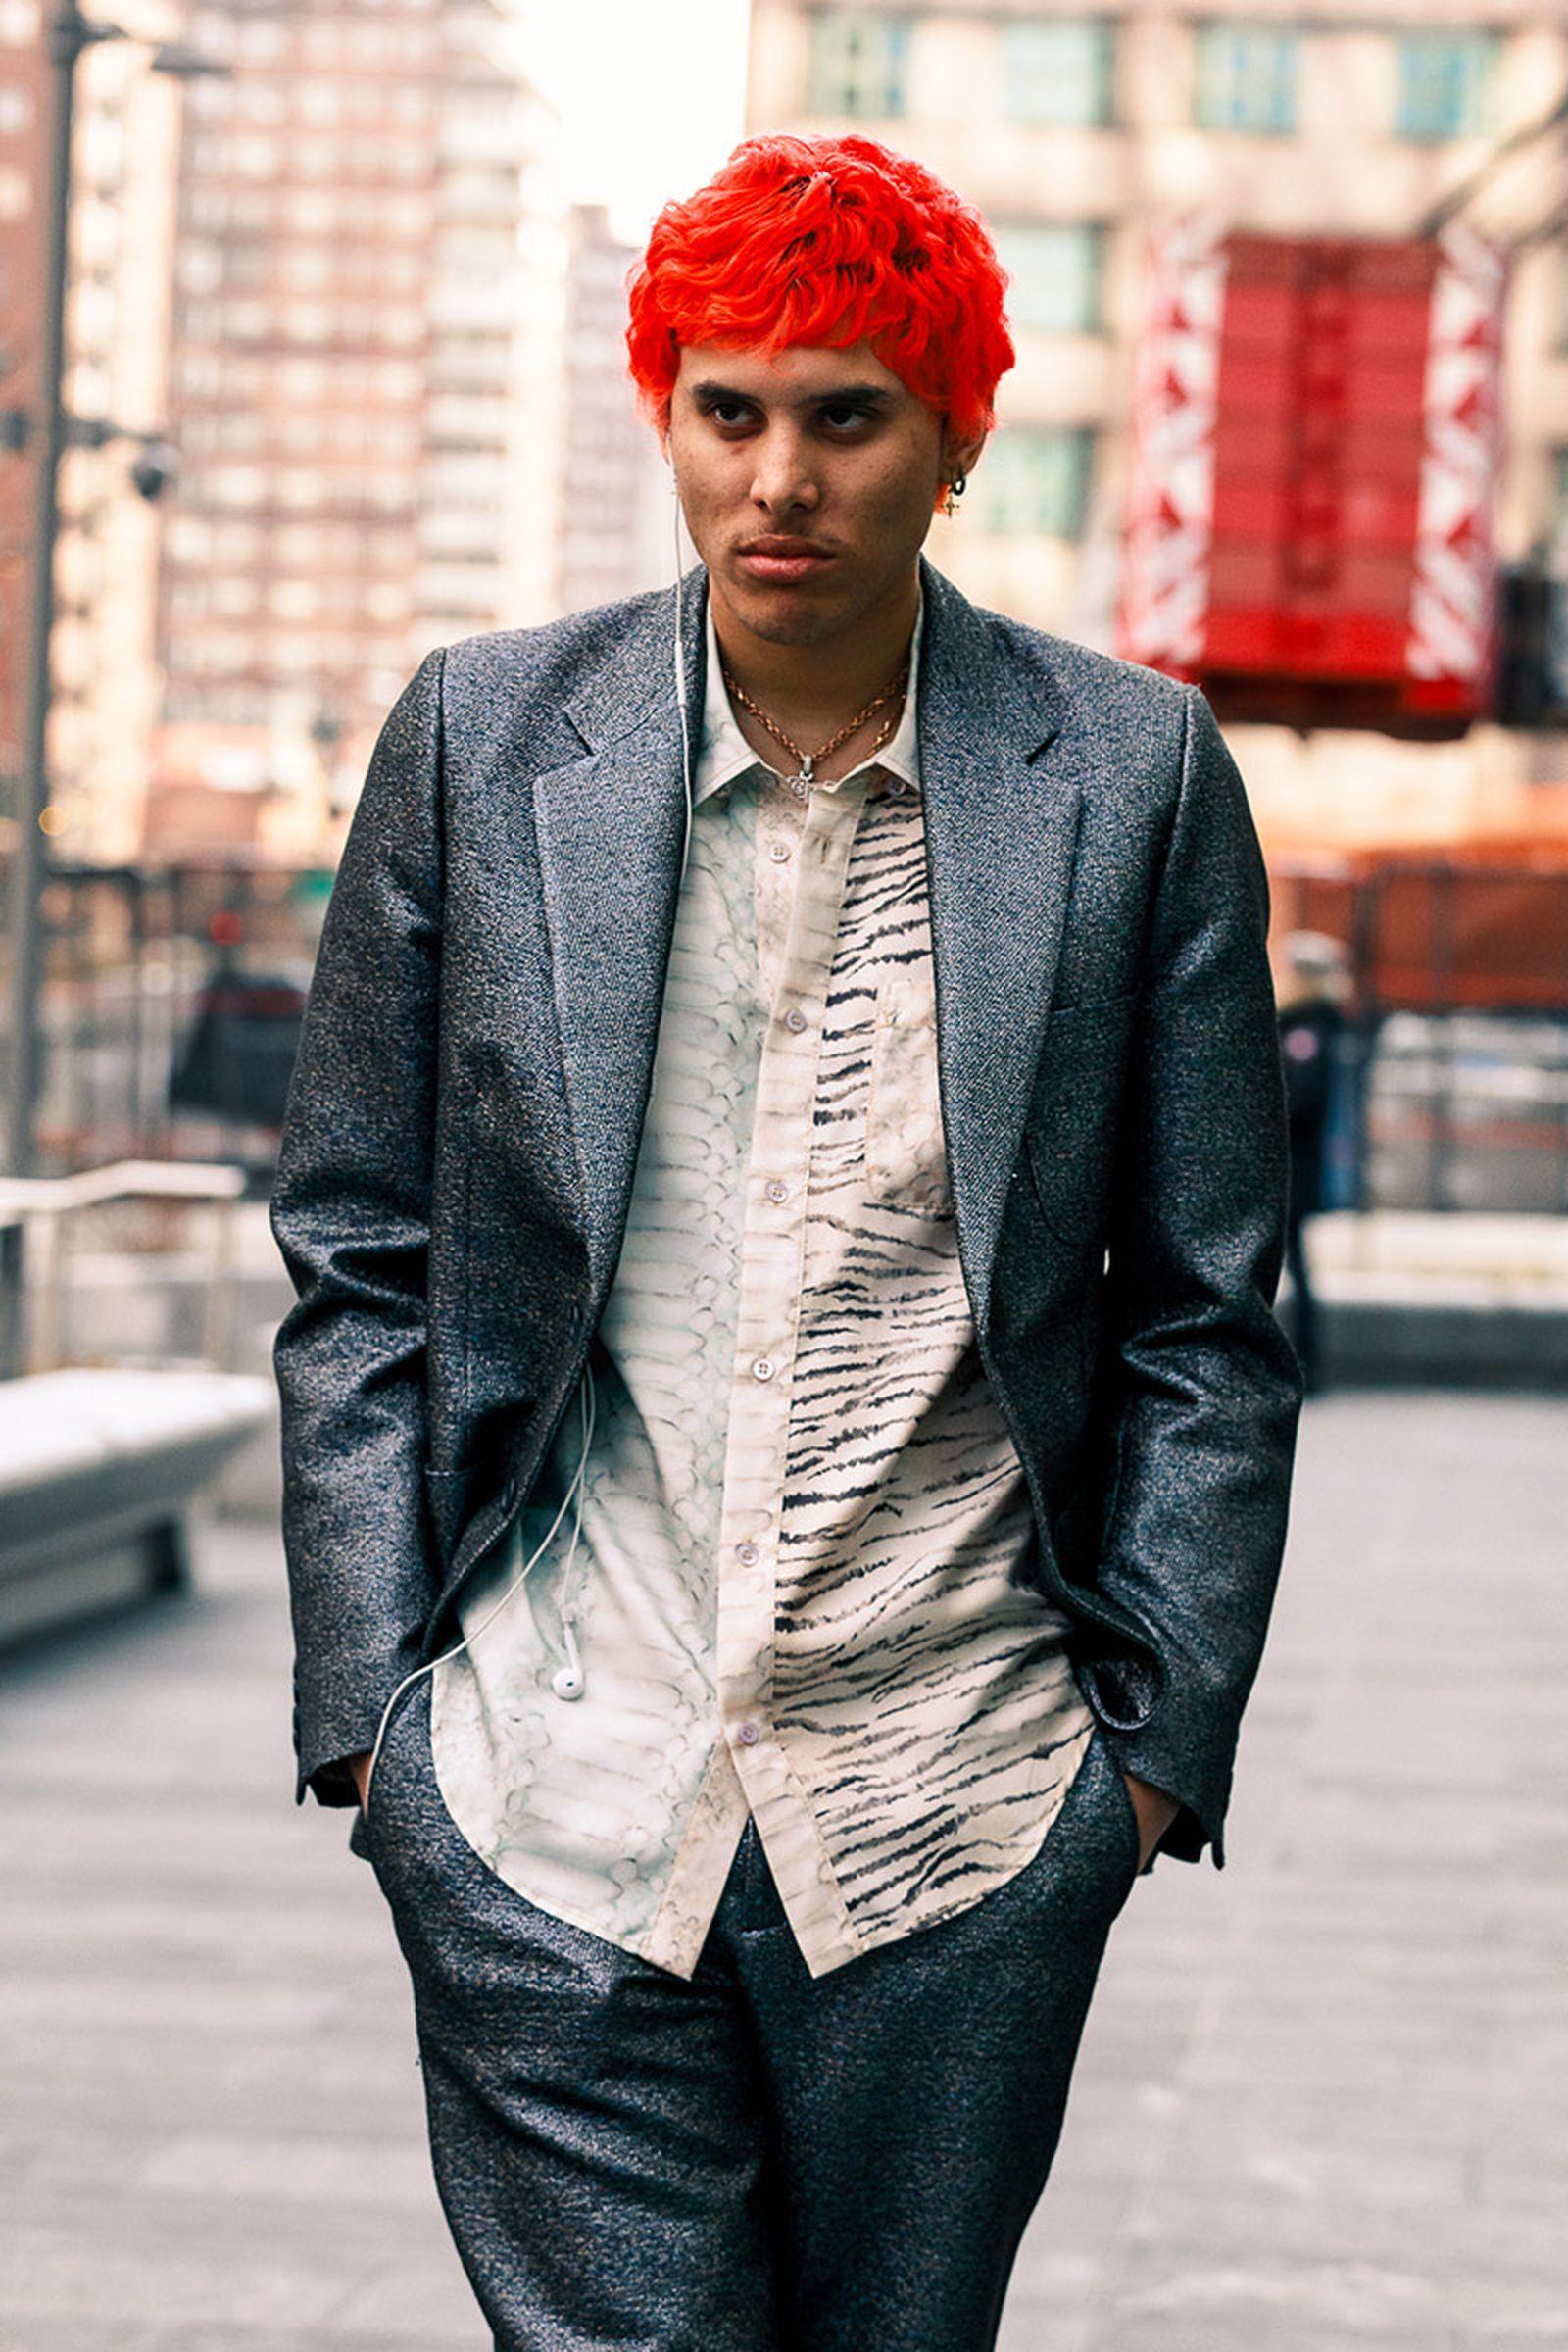 23new-york-fashion-week-mens-street-style-